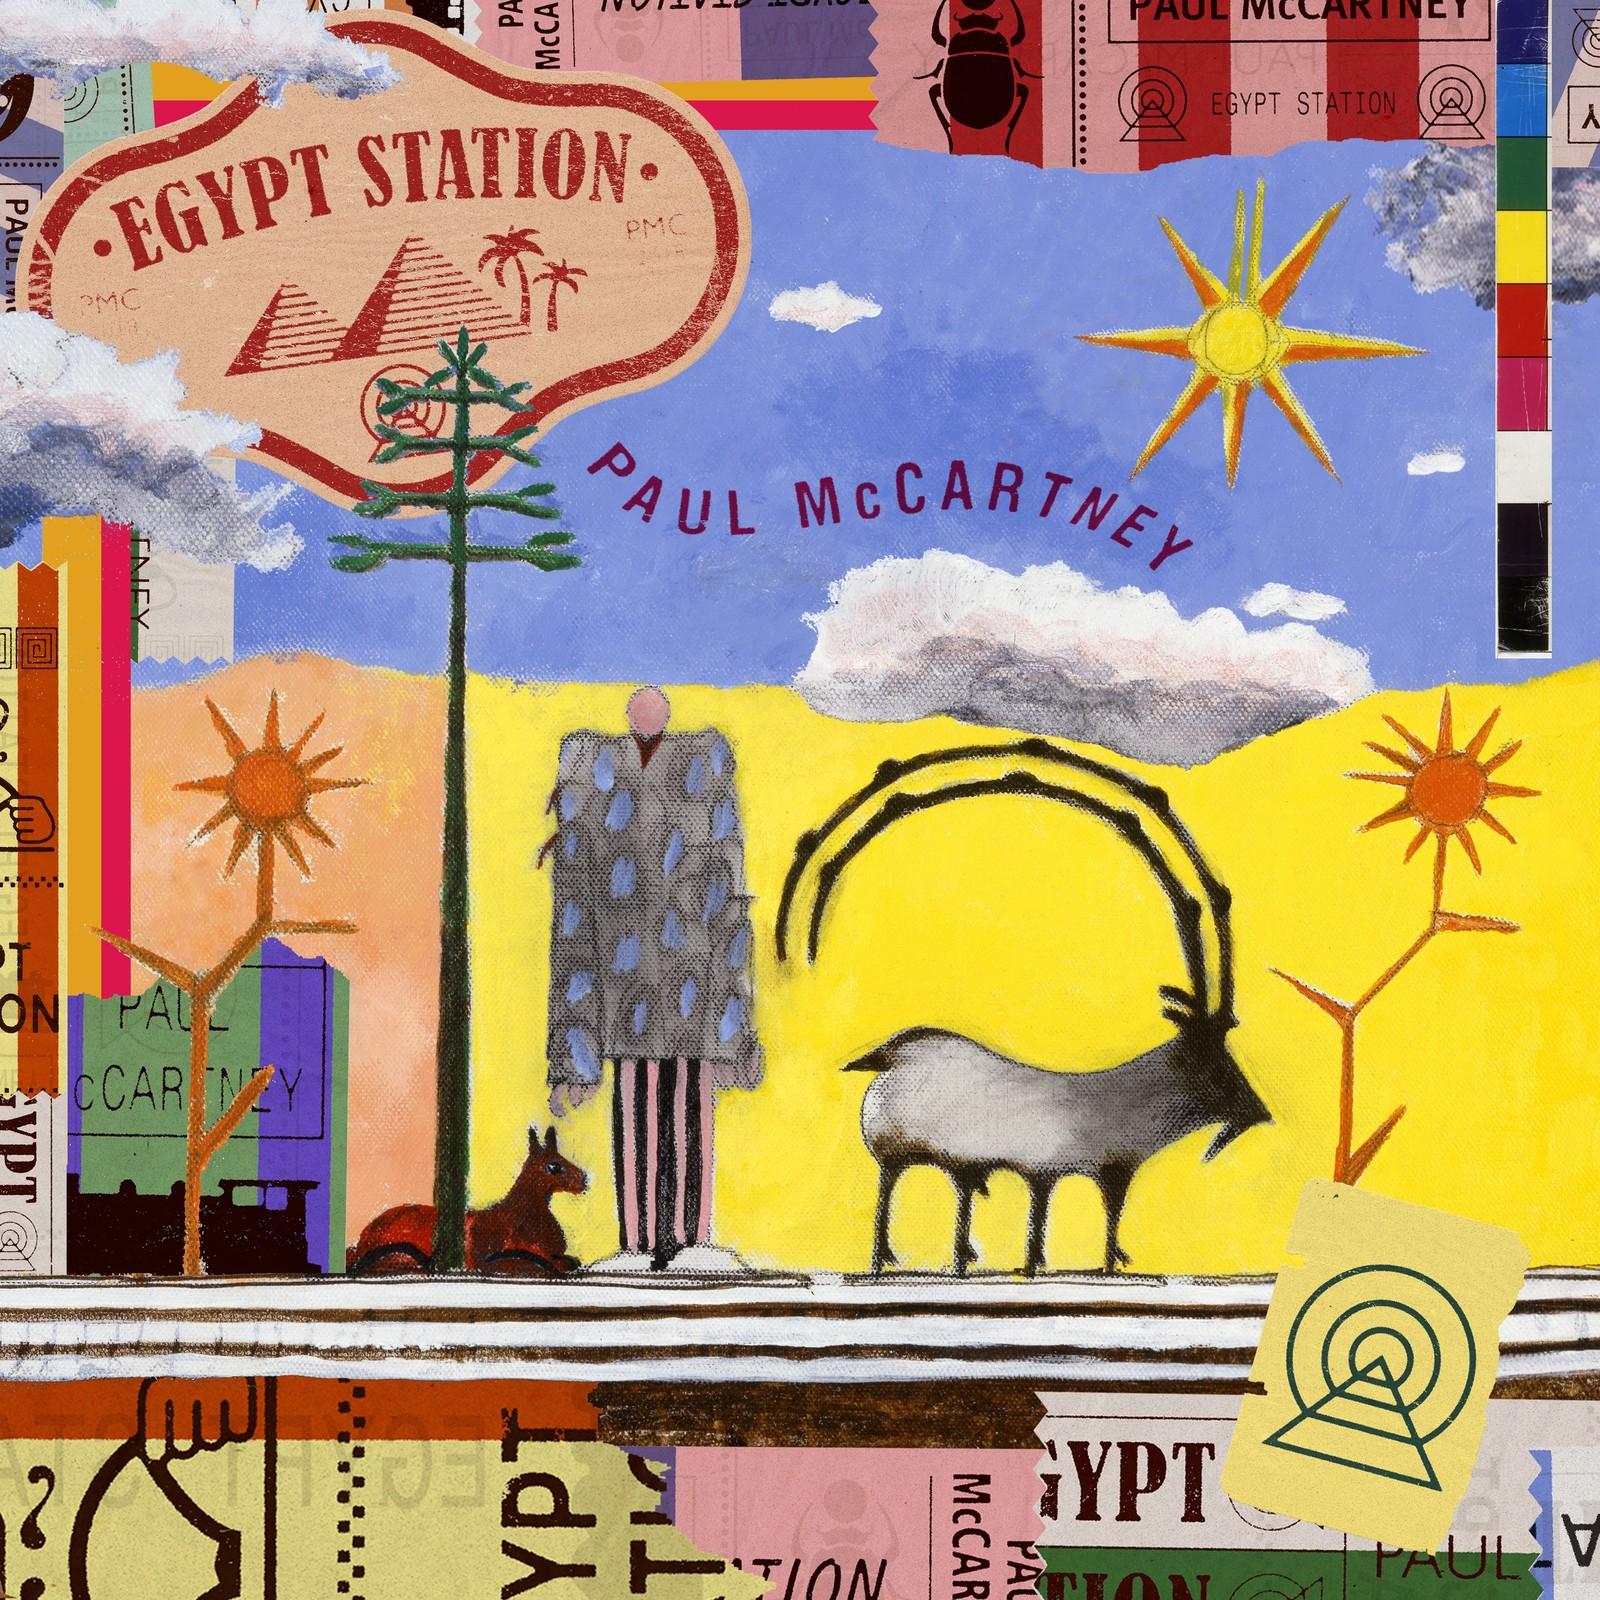 Egypt Station by Paul McCartney image